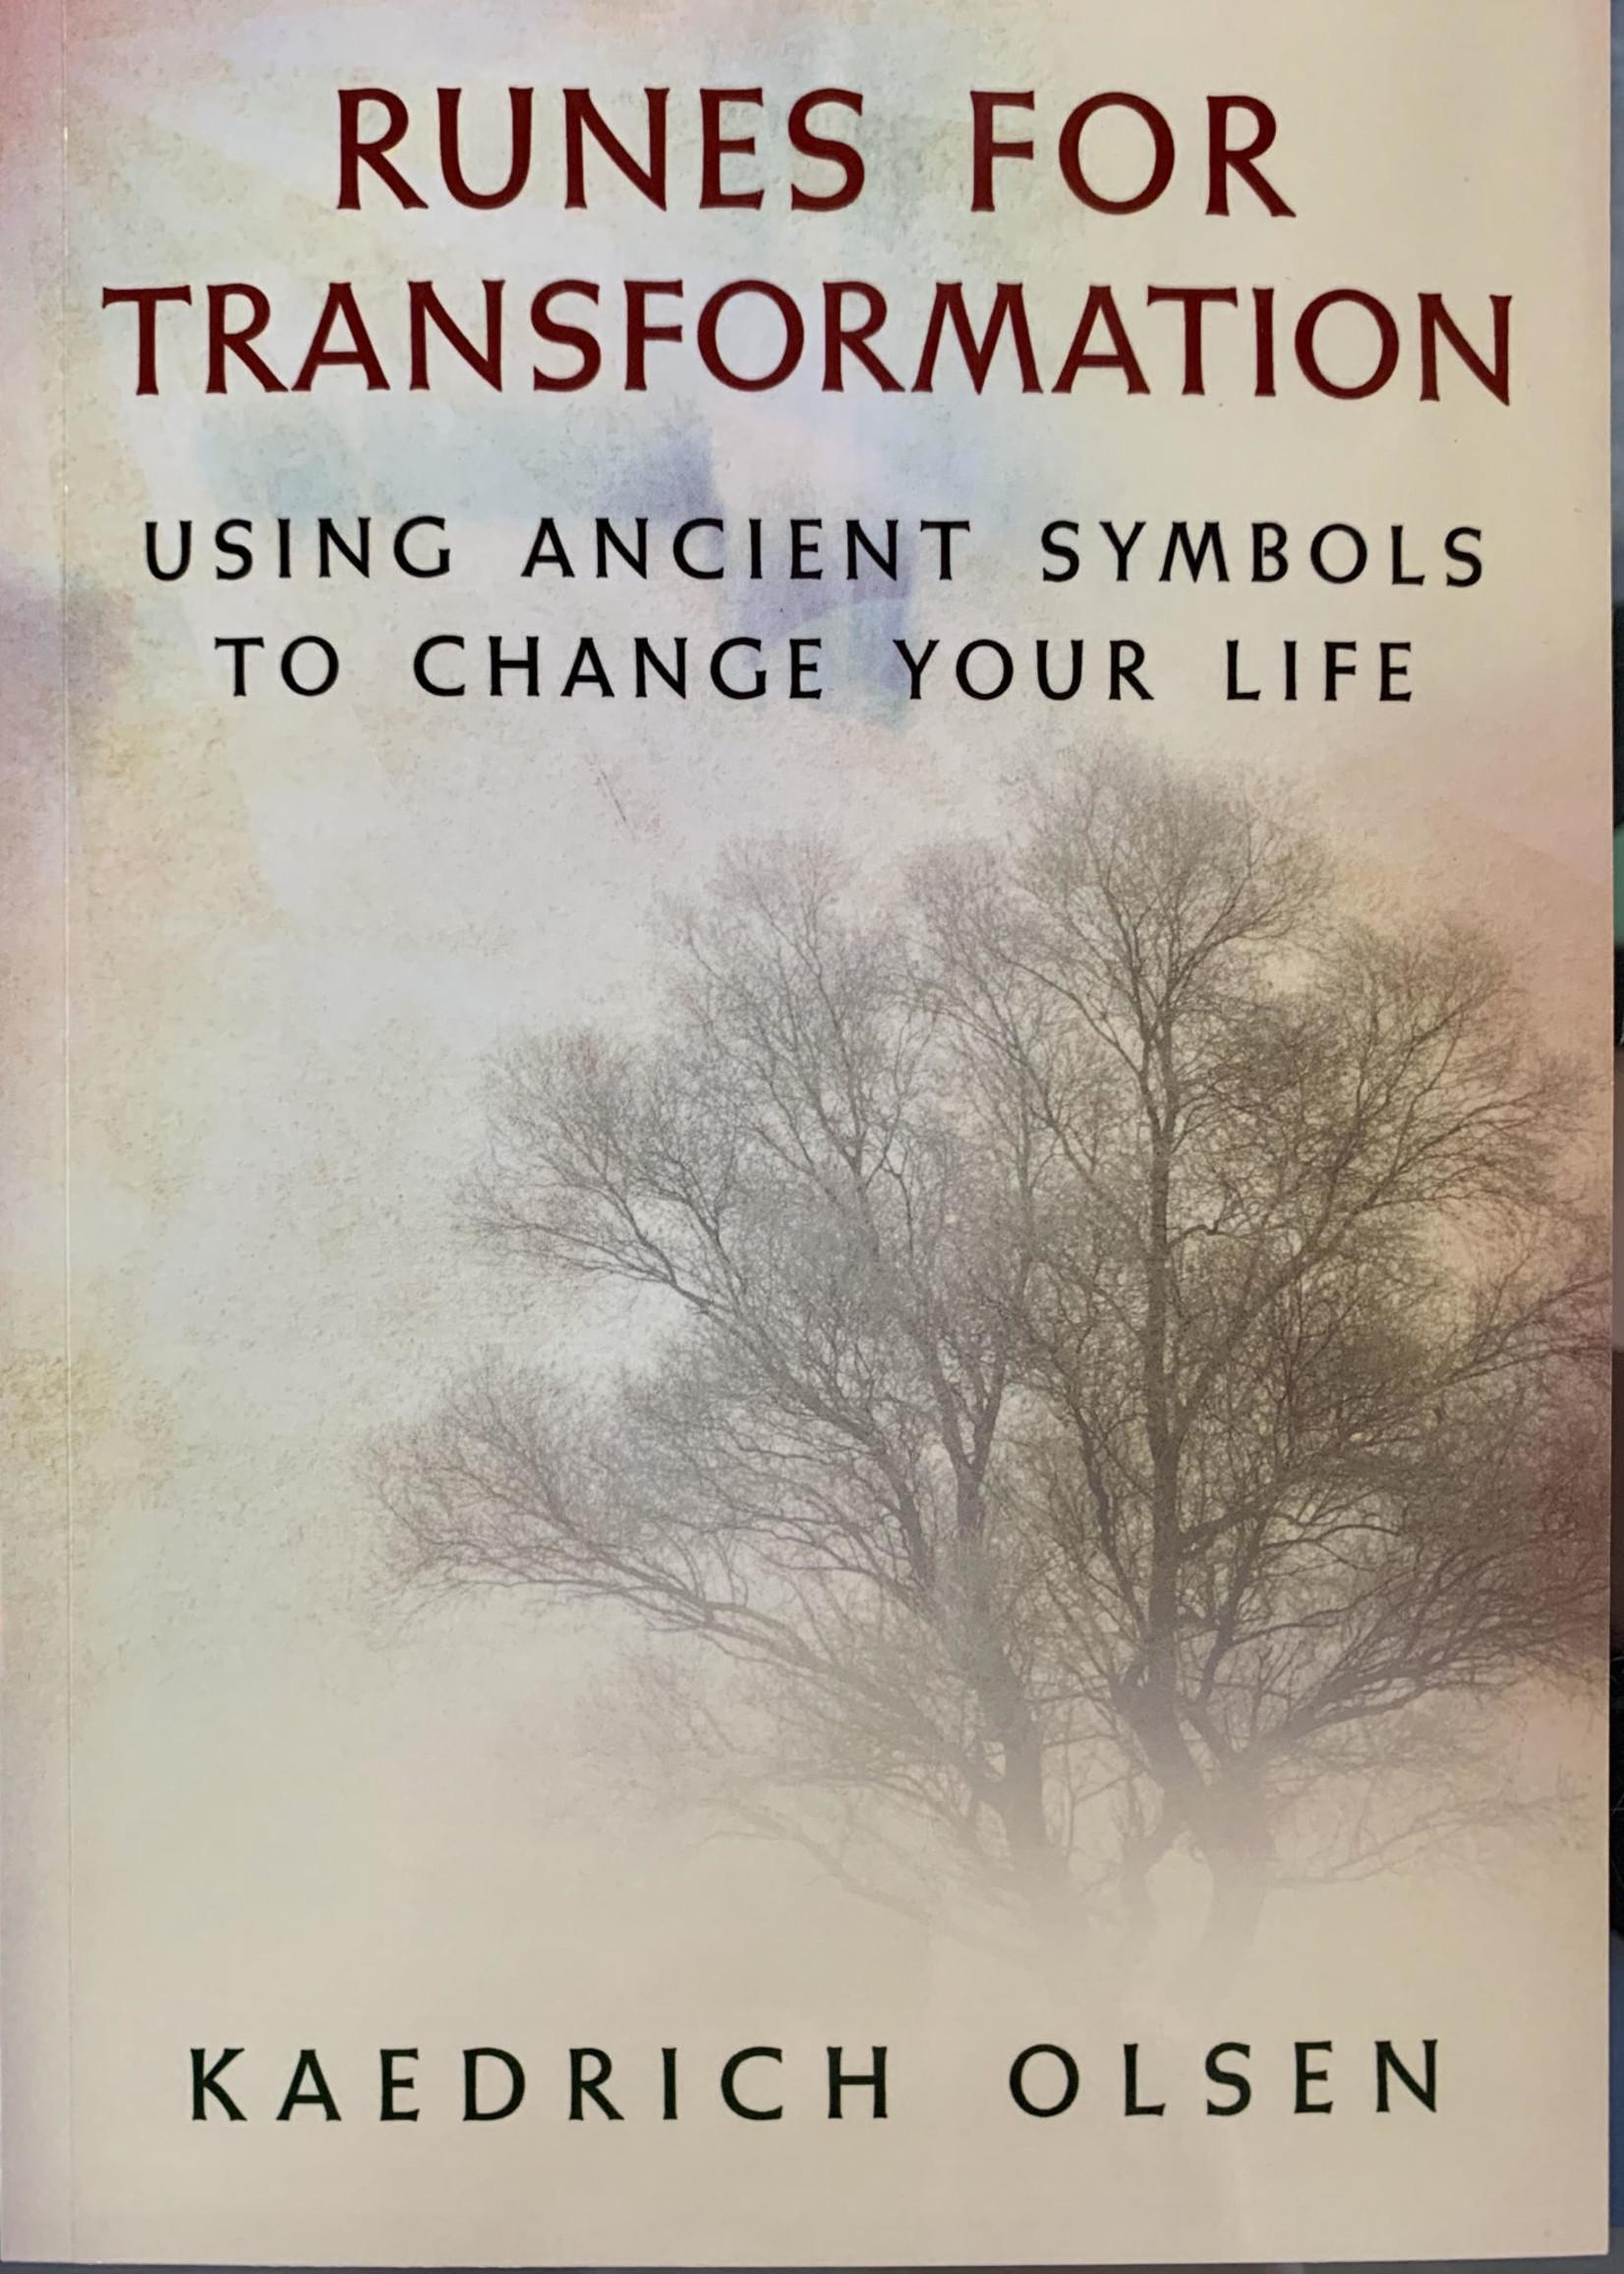 Runes for Transformation